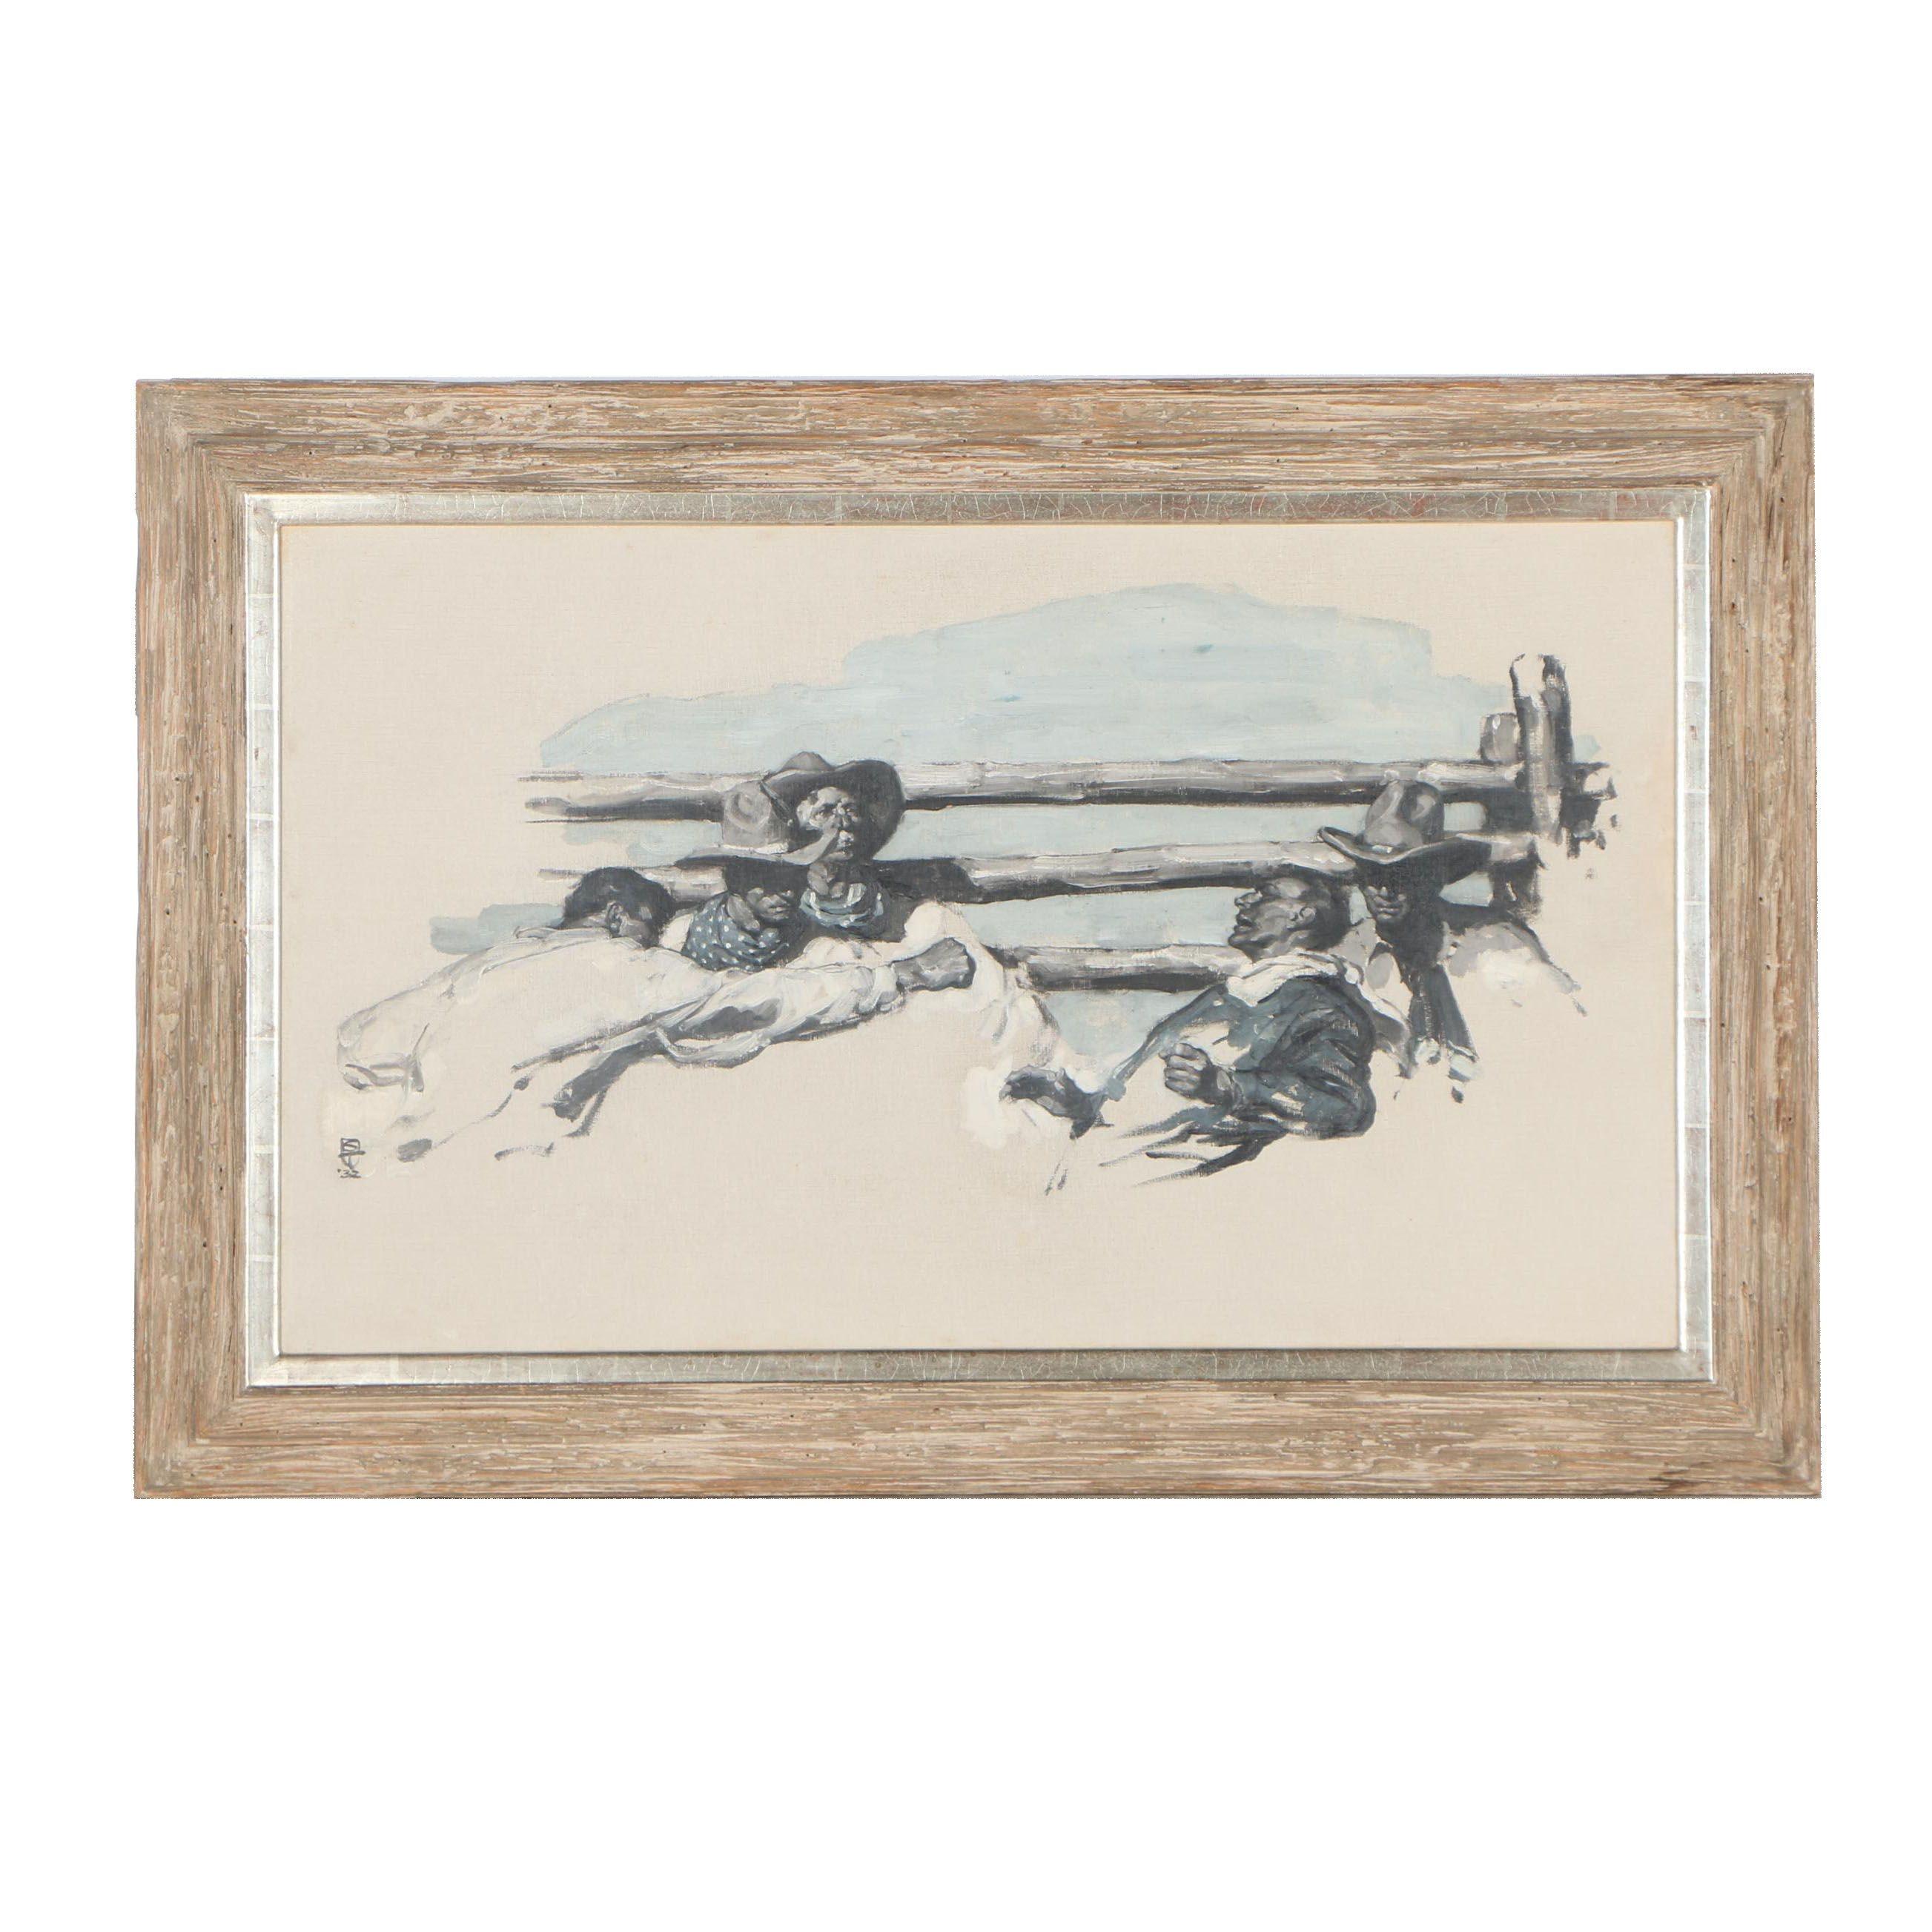 Saul Tepper Western Scene Oil Illustration, 1932